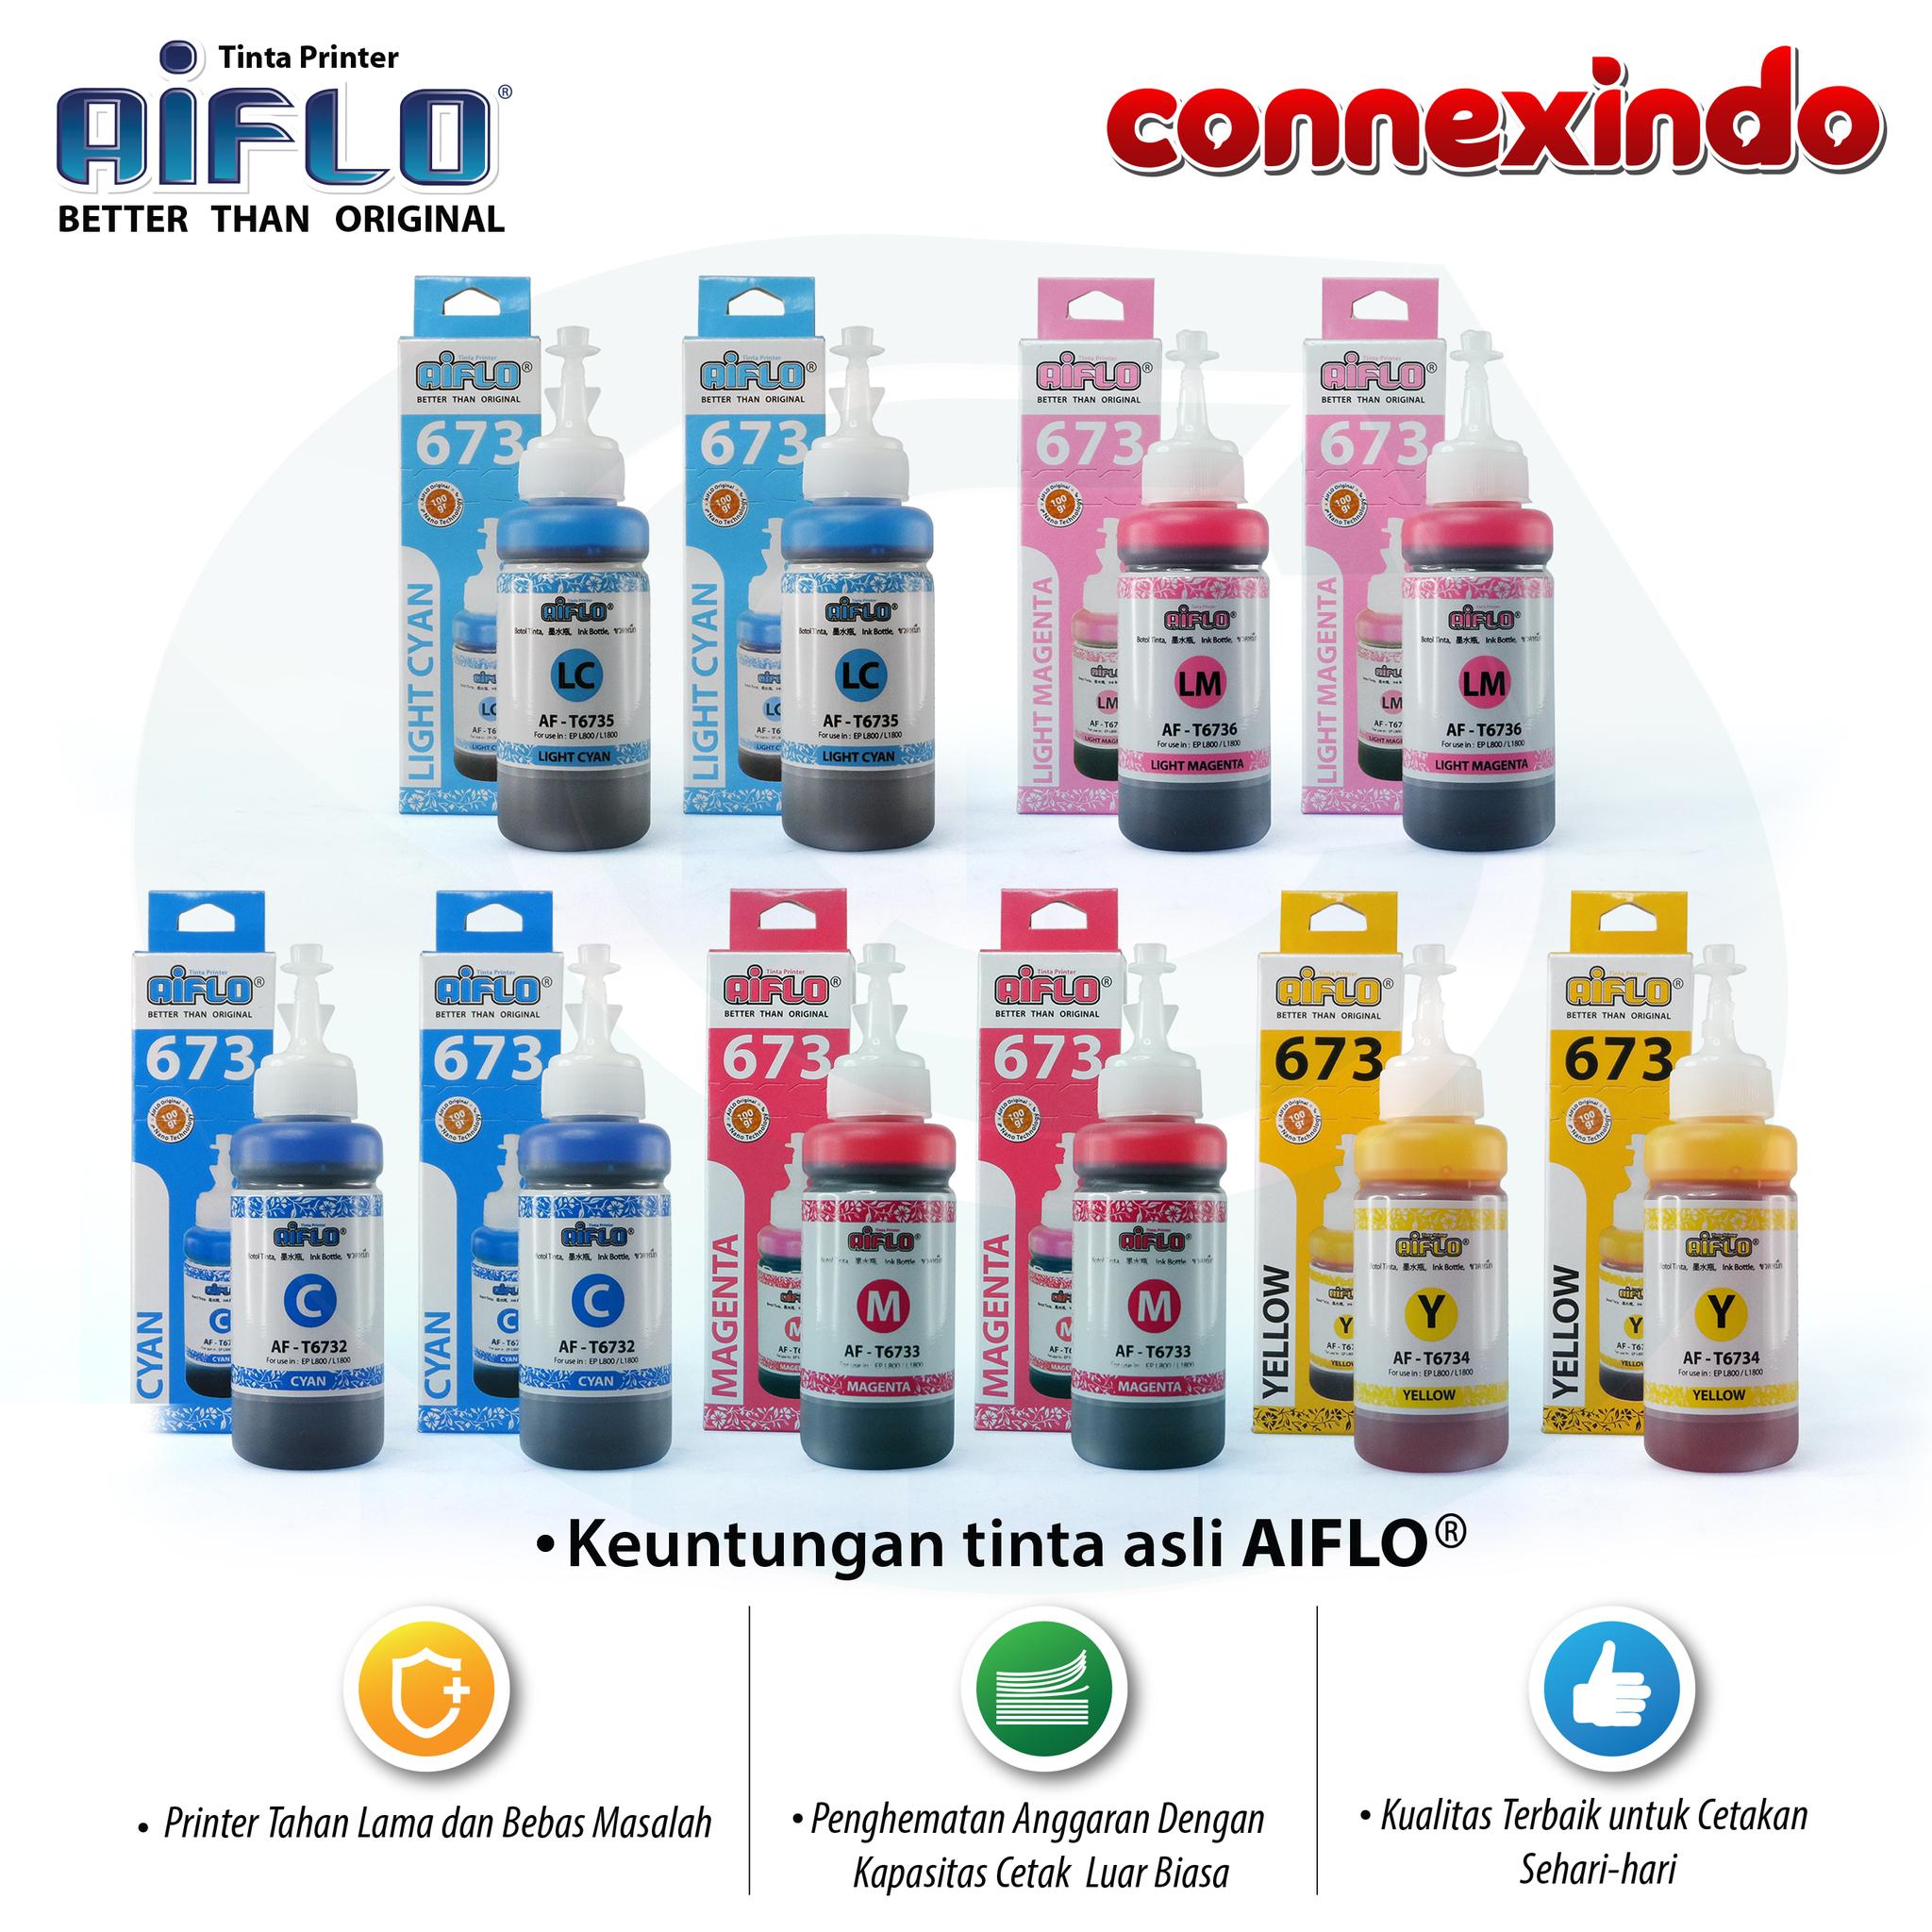 Aiflo 673 Paket Spesial Color Untuk Printer Epson L800 L805 - 10 Tinta